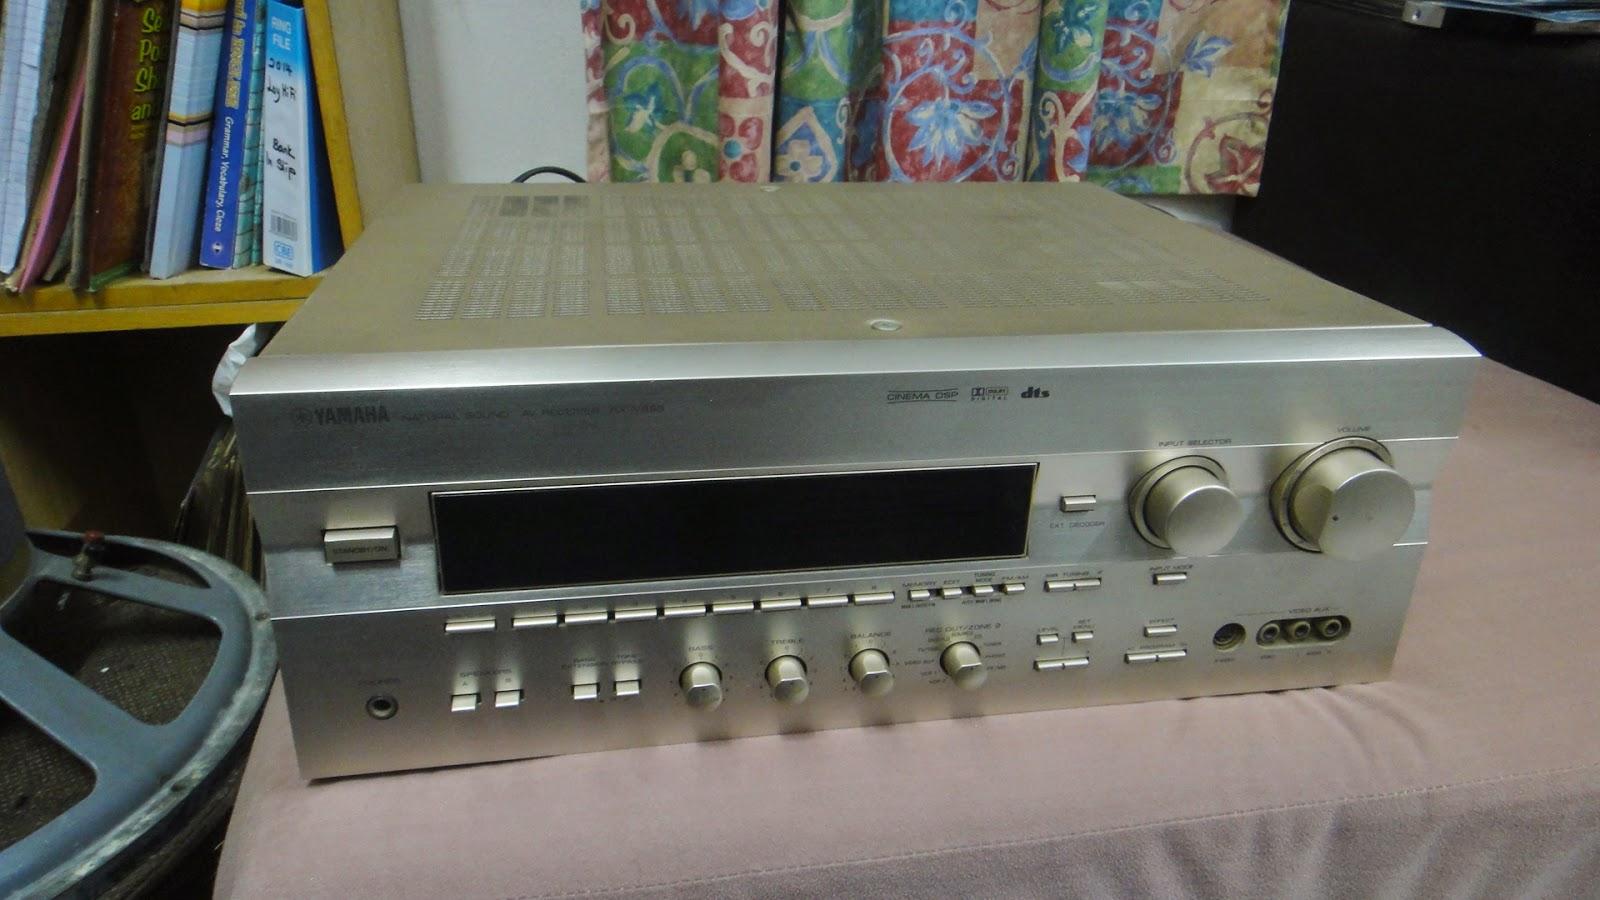 Yamaha rx v995 natural sound av receiver used sold for Yamaha receiver customer support phone number